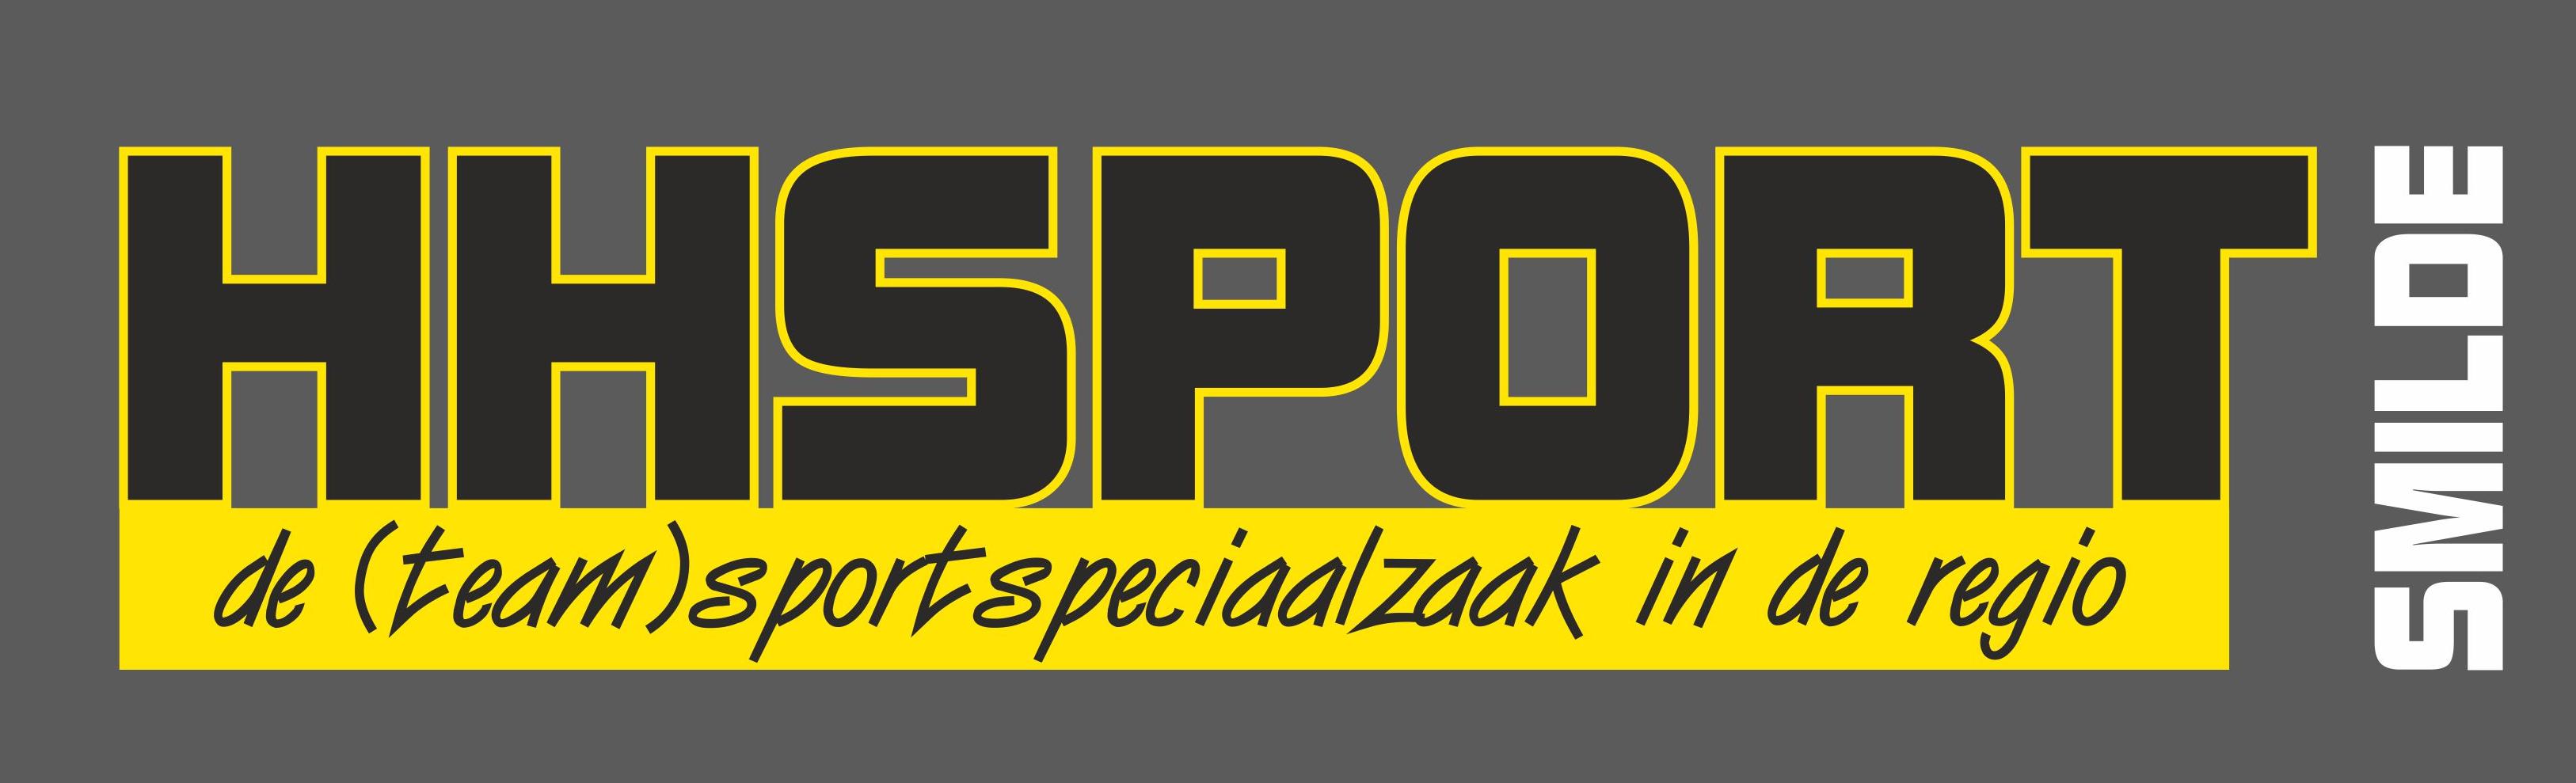 HHsport